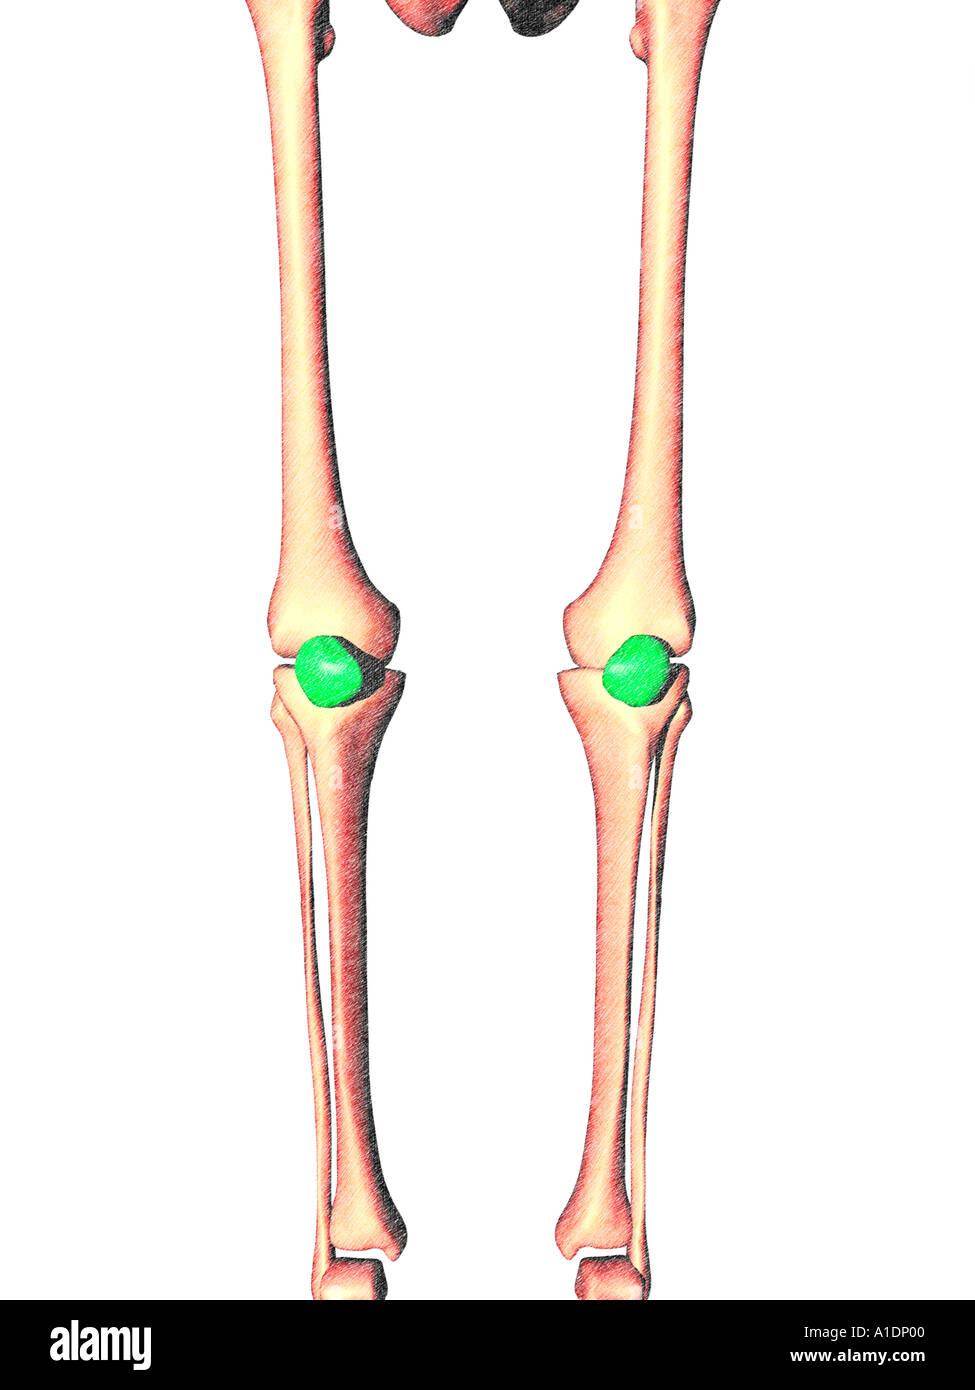 hight resolution of illustration of patella highlighted on legs